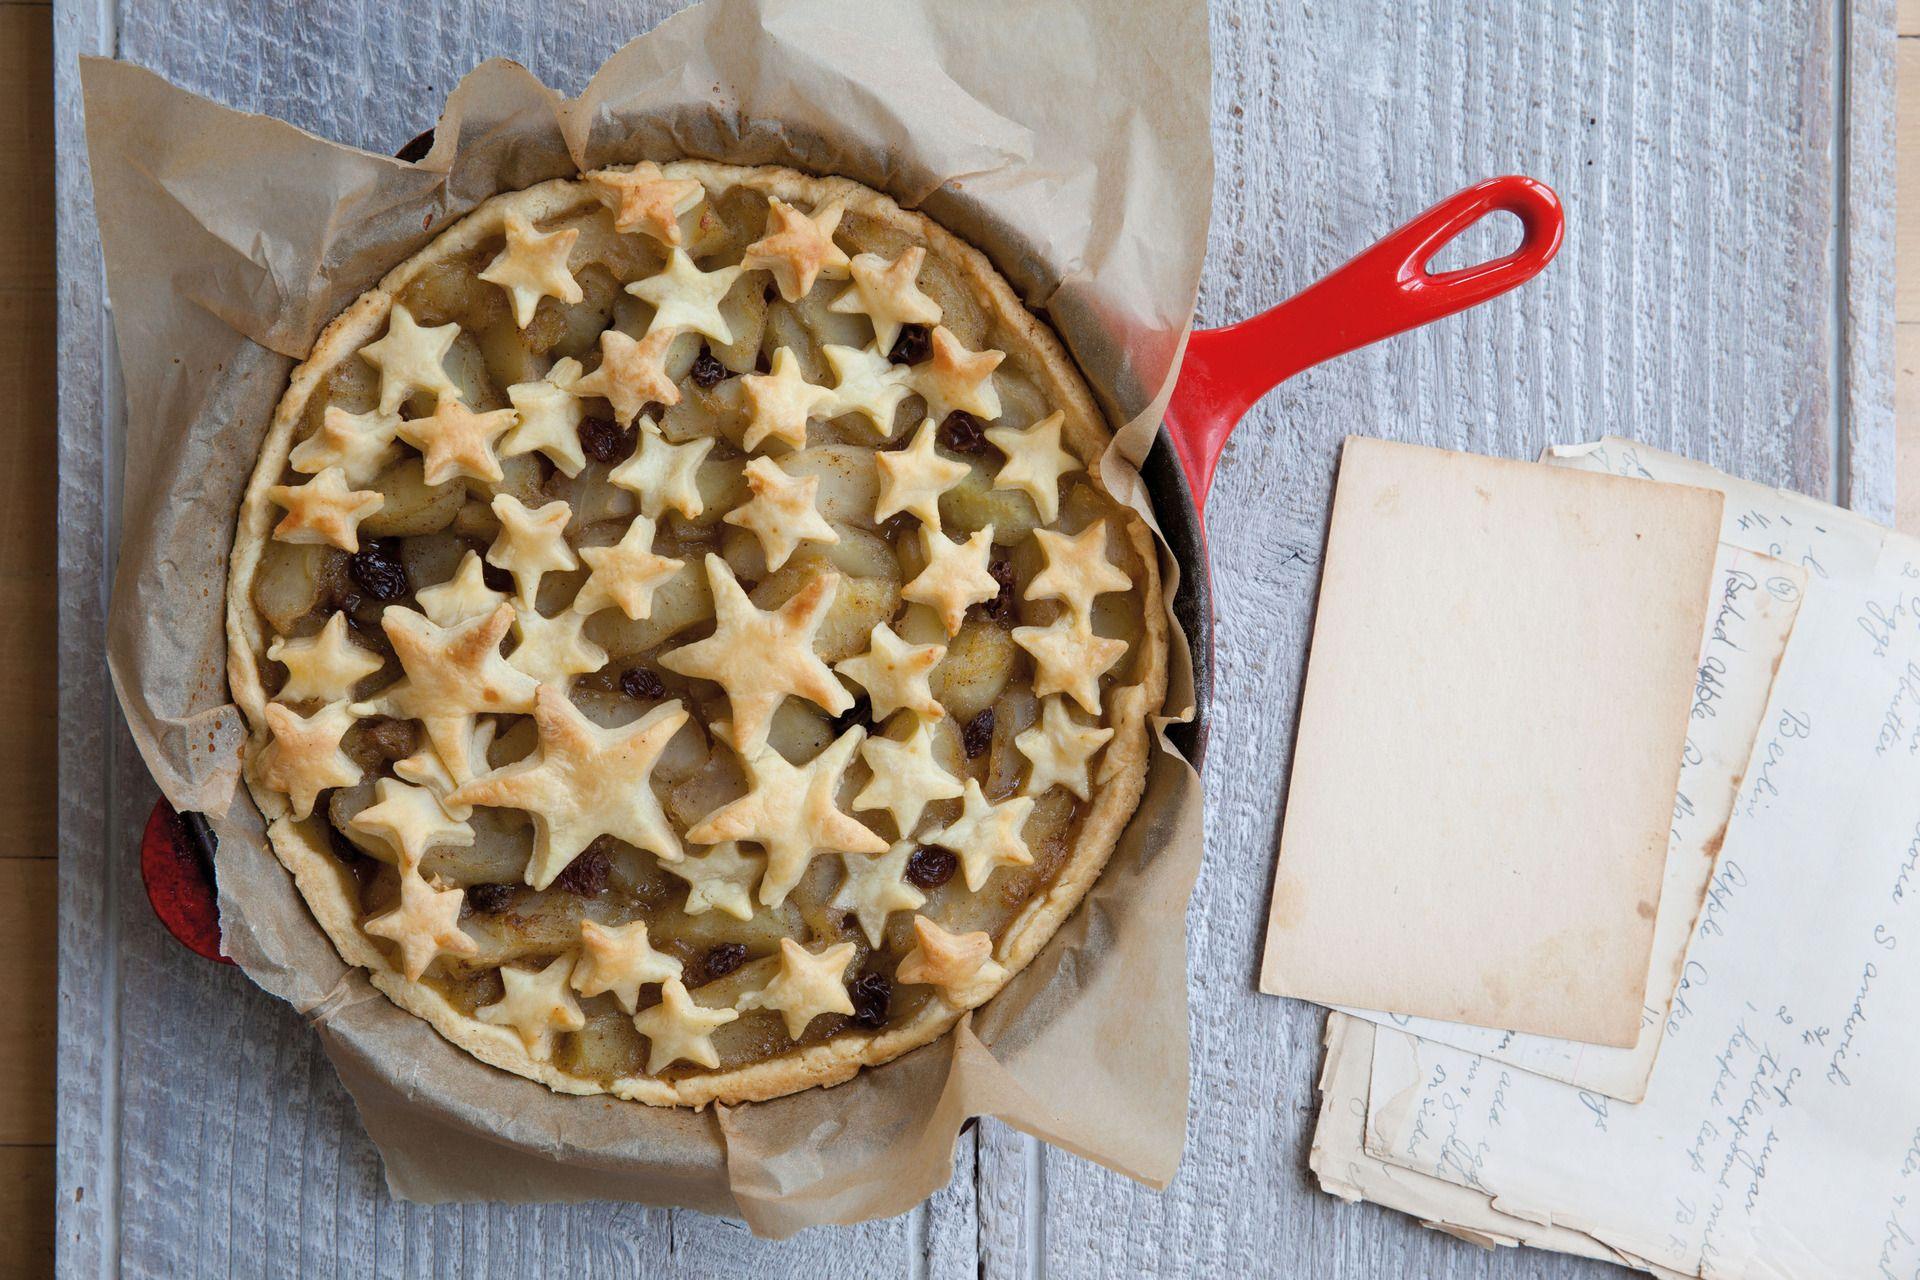 Stellar Apple Pie Photo Annabel Langbein Media Kiwi Recipes Sweet Recipes Food